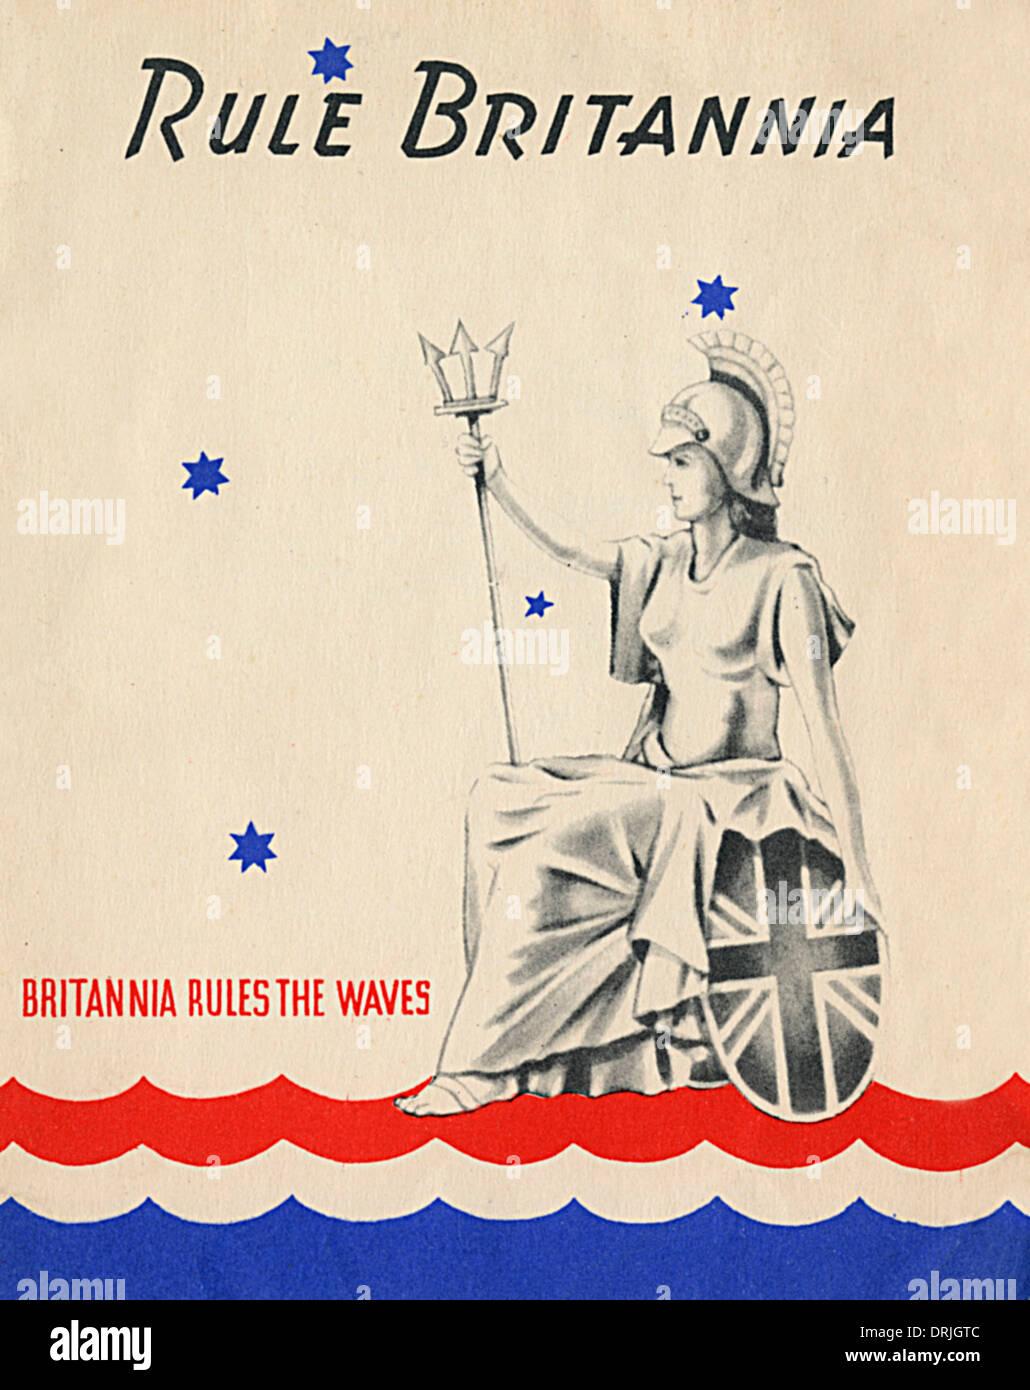 Rule Britannia - Britannia Regeln die Wellen Stockbild